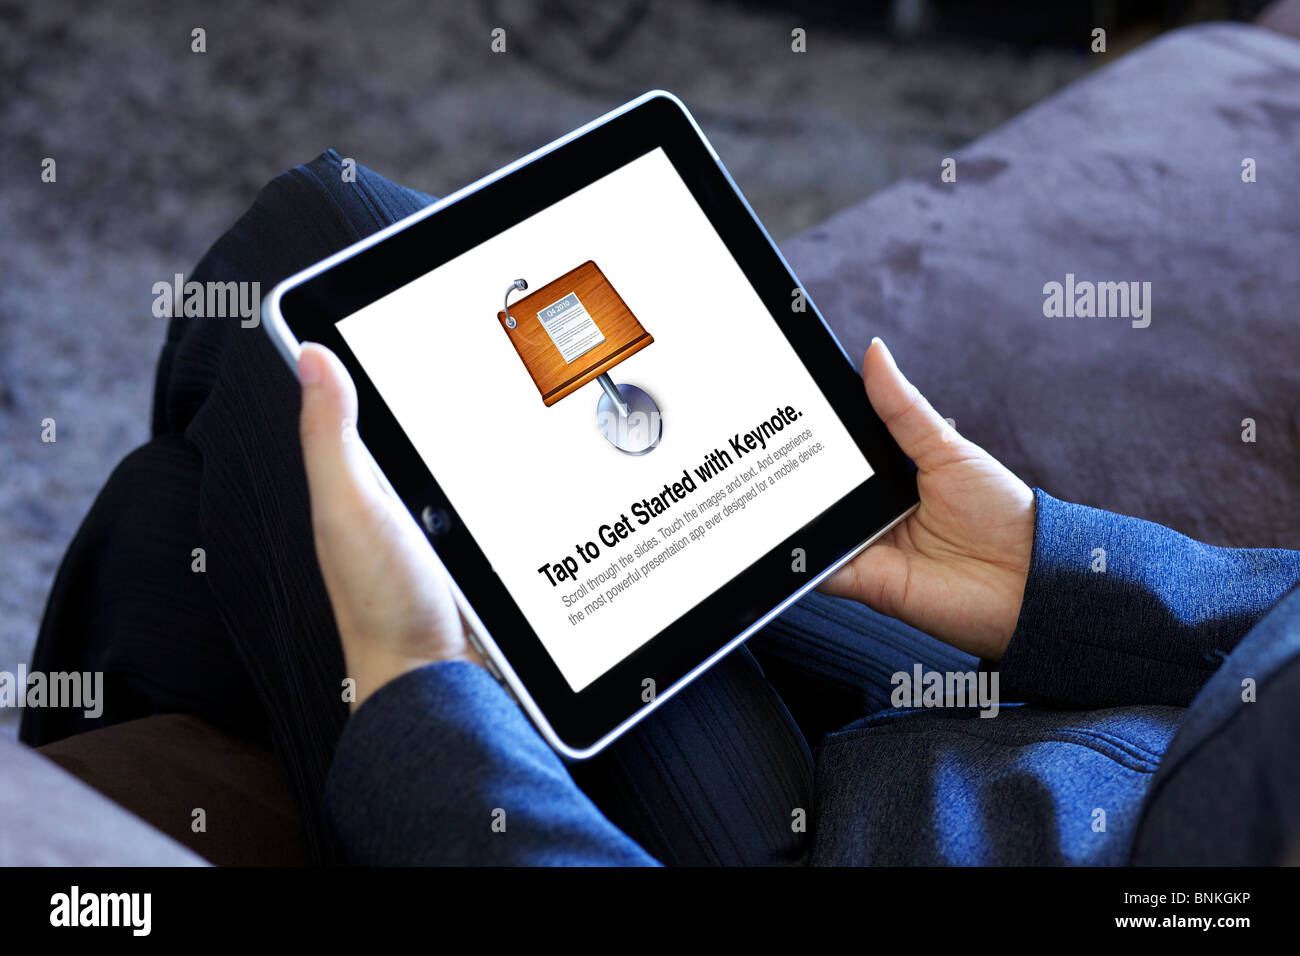 A business woman using Keynote app on an iPad to make presentations